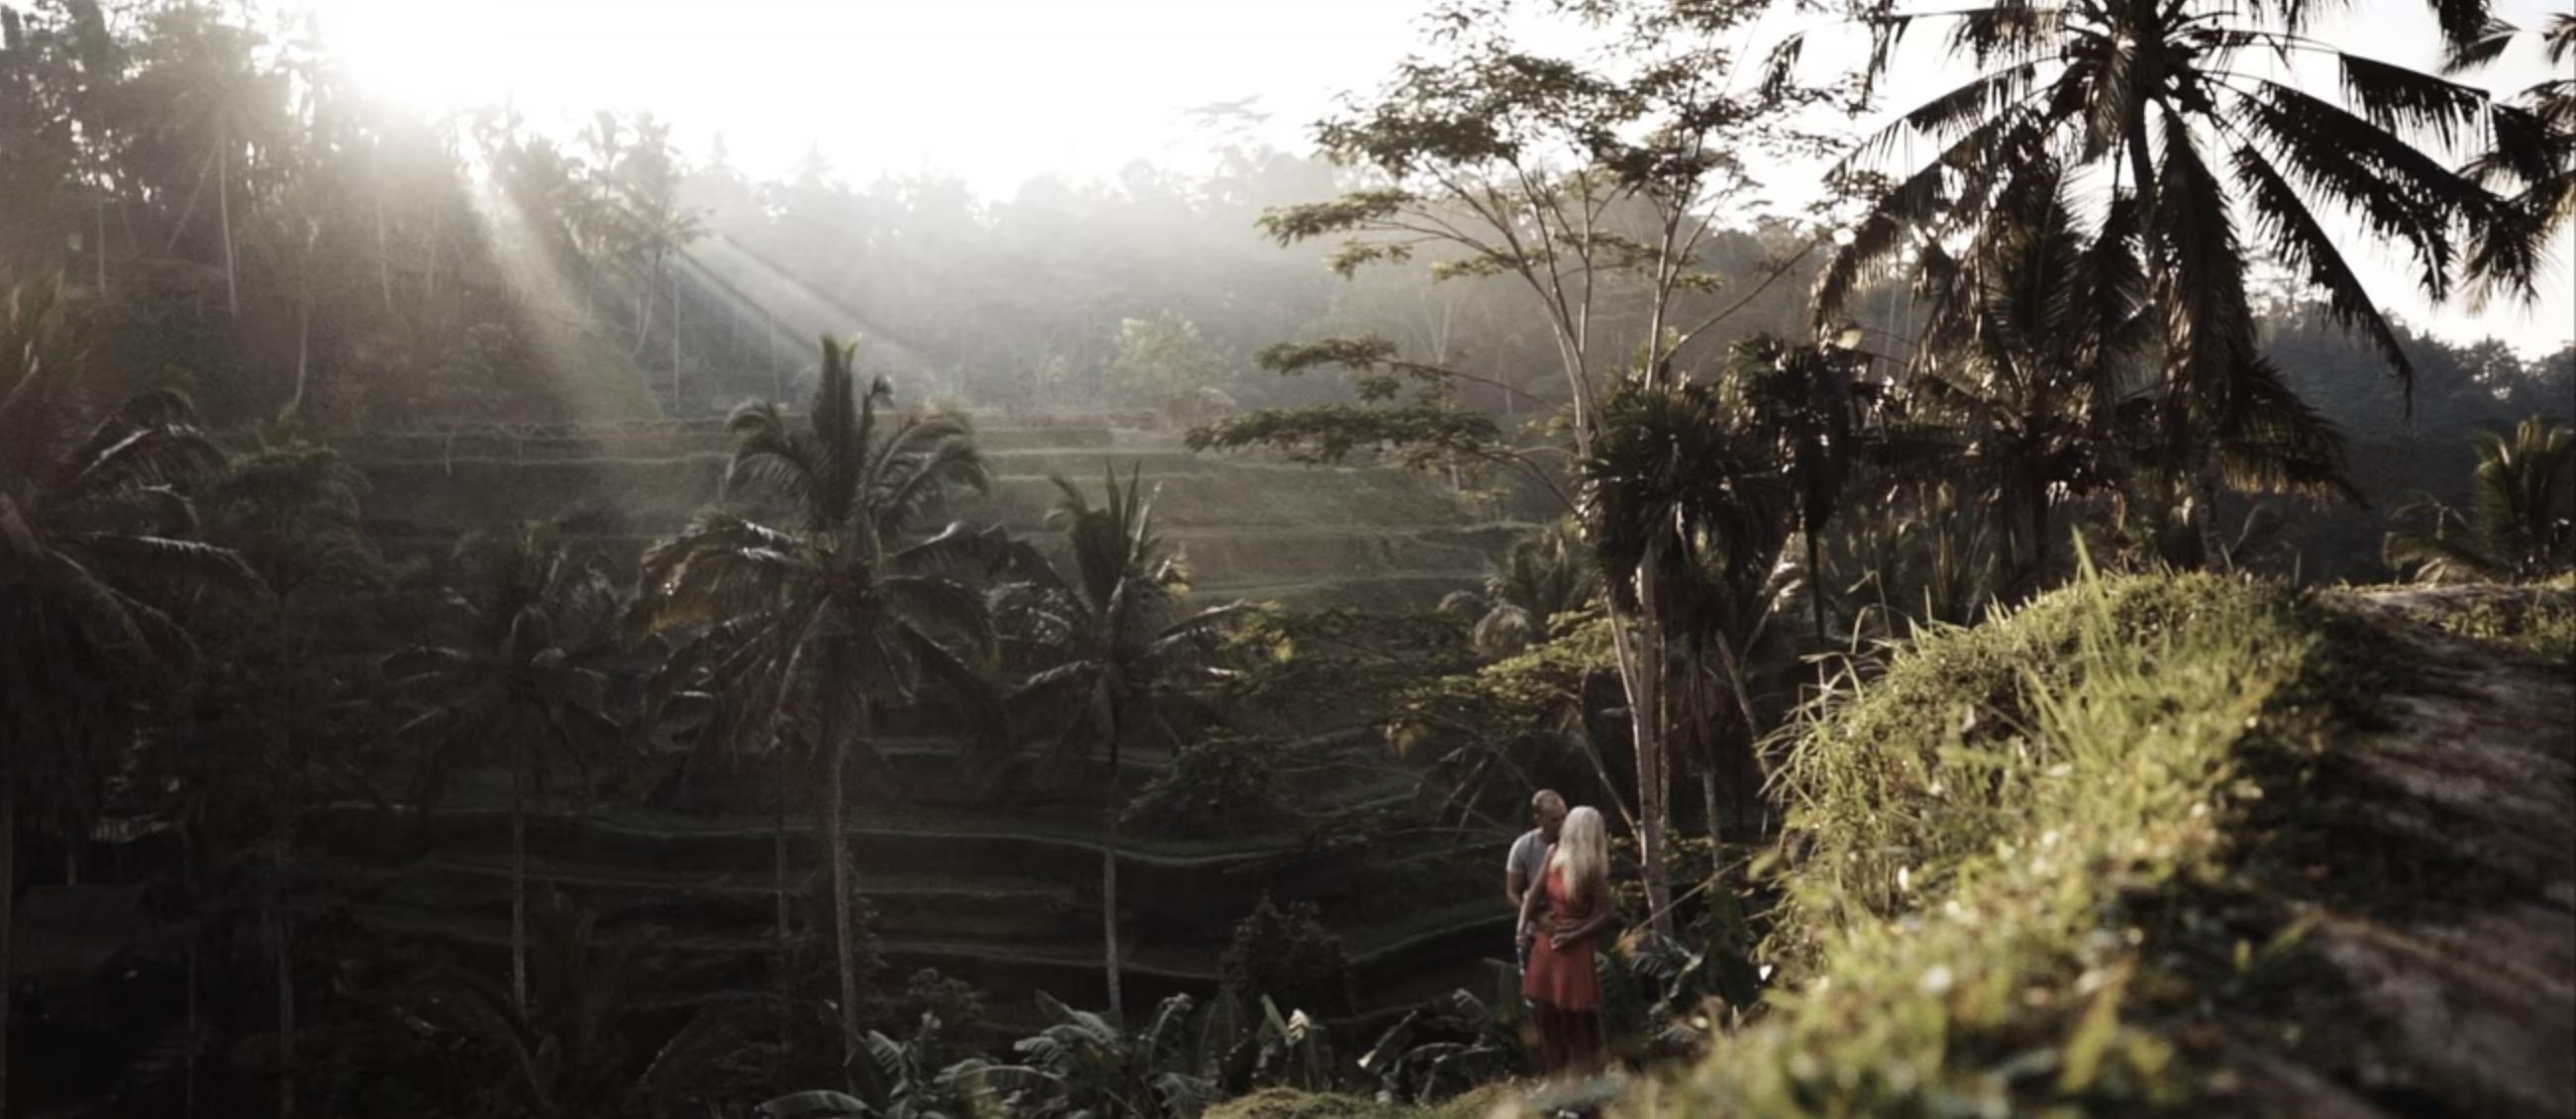 Birgit + Mathias | Bali, Indonesia | Bali